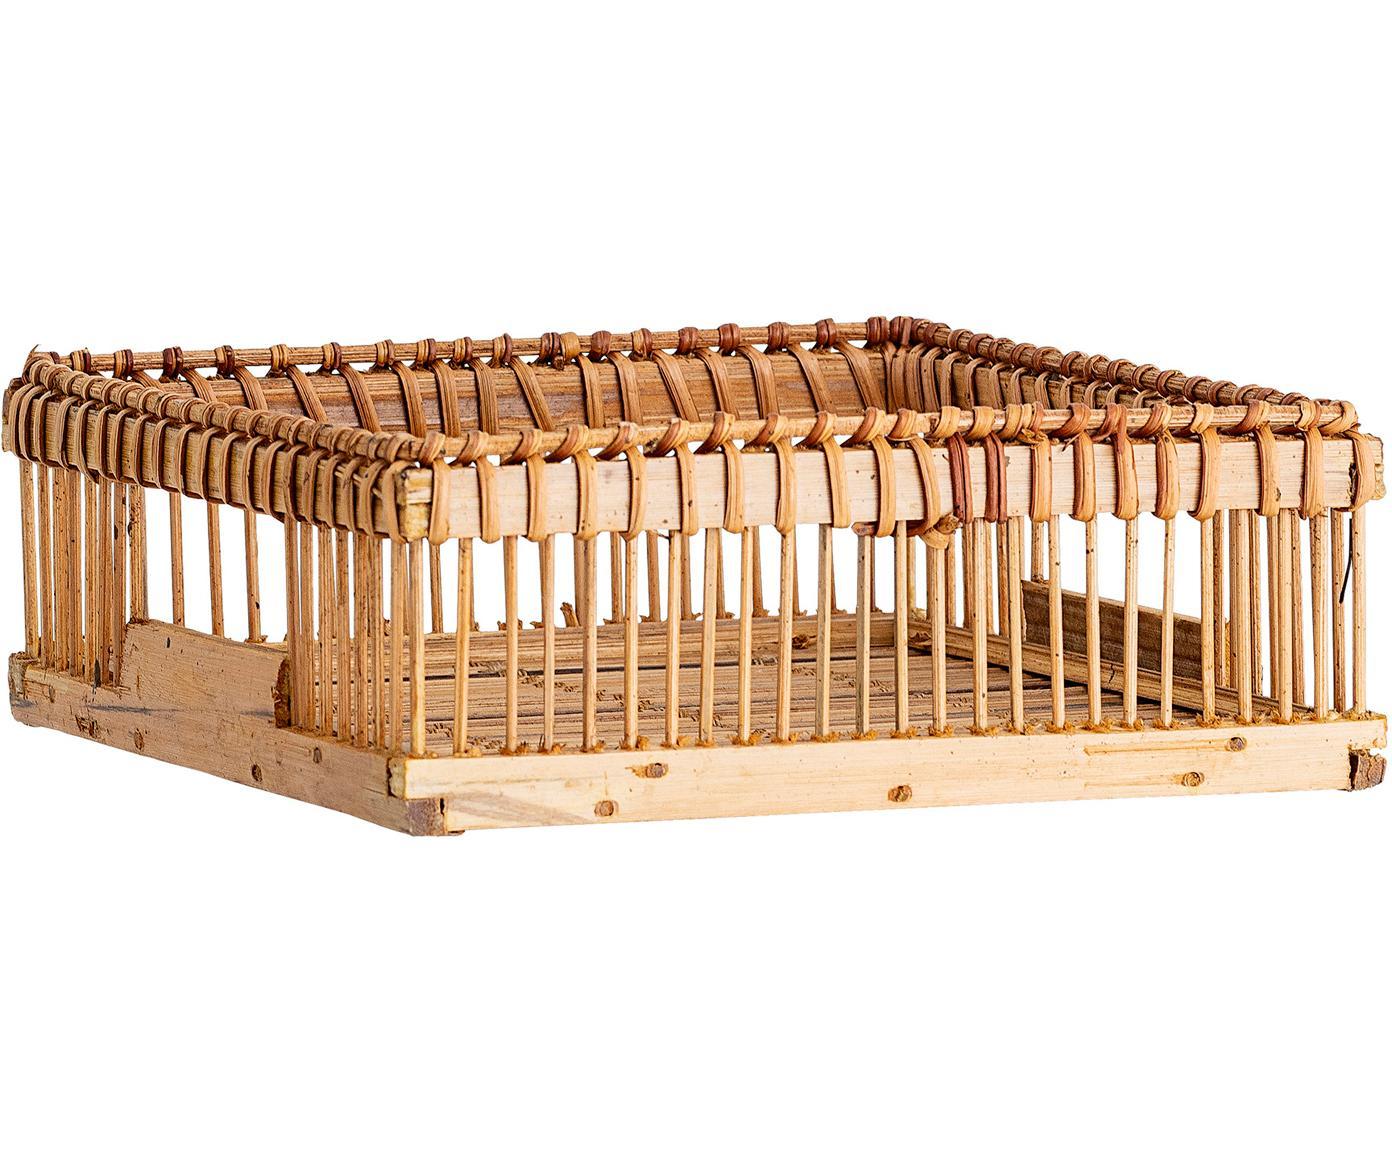 Portatovaglioli in bambù Lamgo, Bambù, Bambù, Larg. 18 x Prof. 18 cm